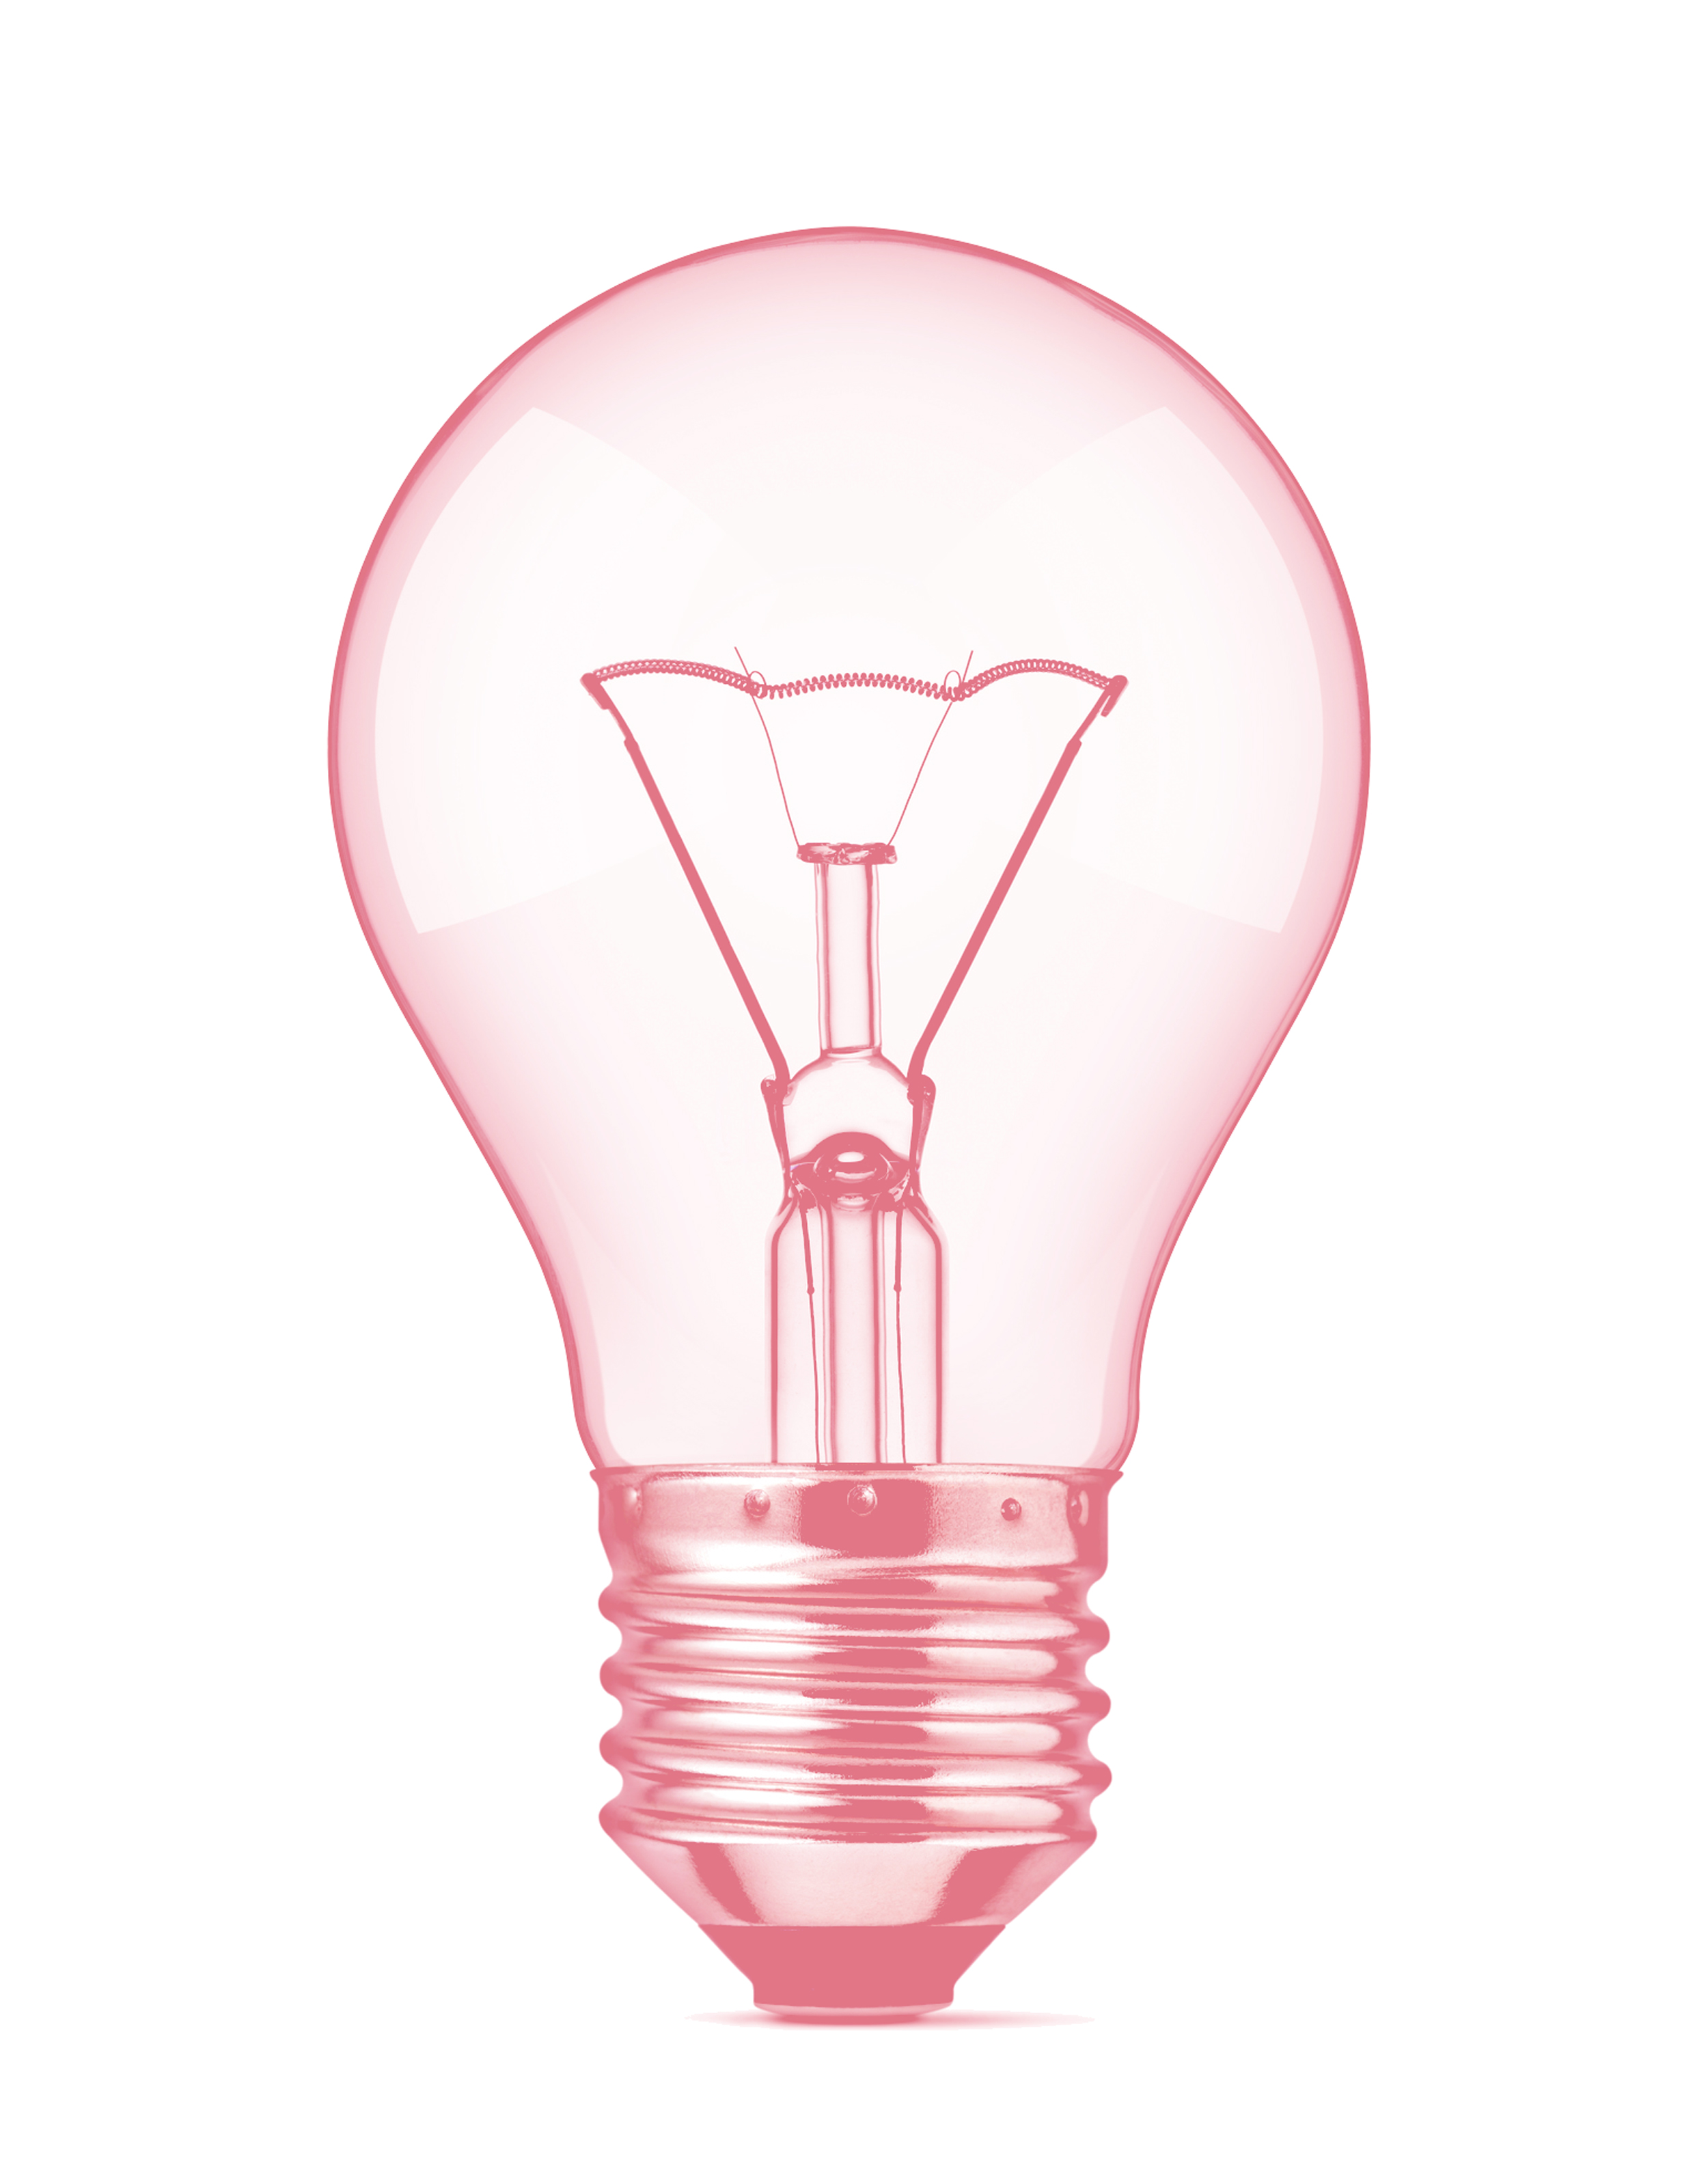 distinc_portfolio_light_bulb.jpg